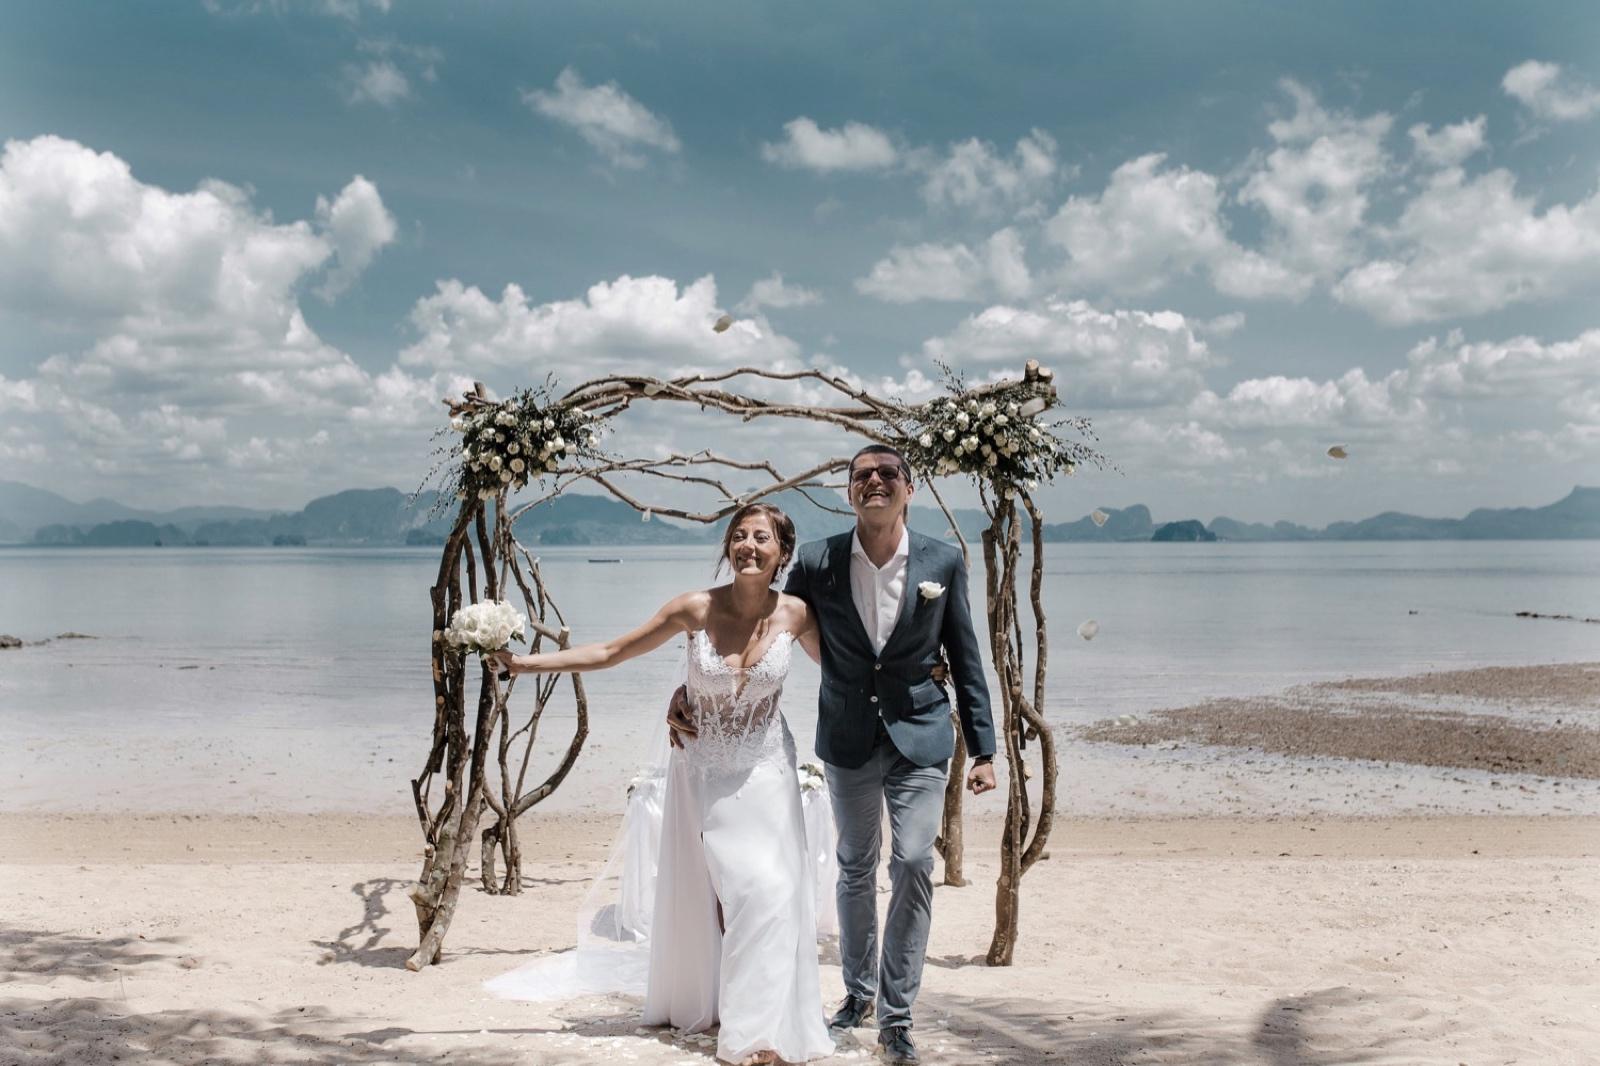 Fotomagoria Best 0f 2018 Wedding Photographer Italy82.jpg